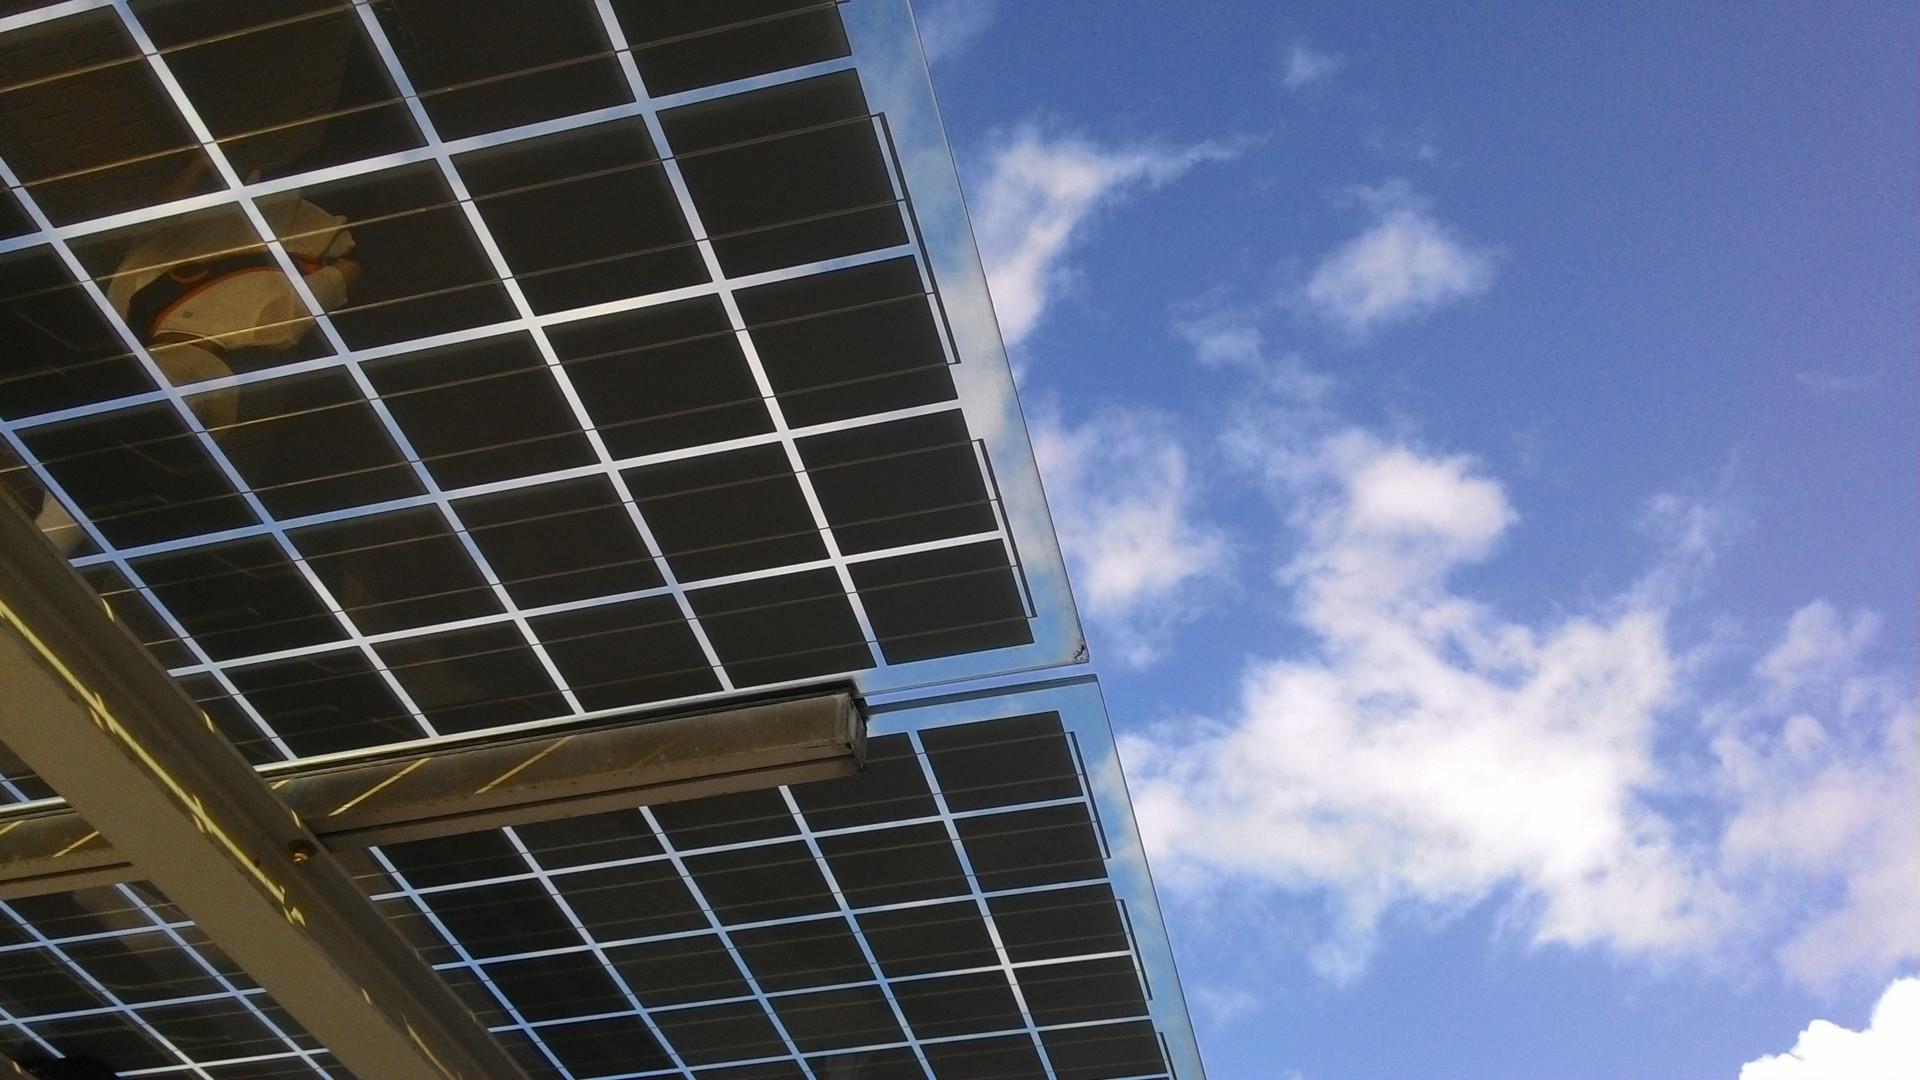 Optimizing Photovoltaic Generation with Machine Learning